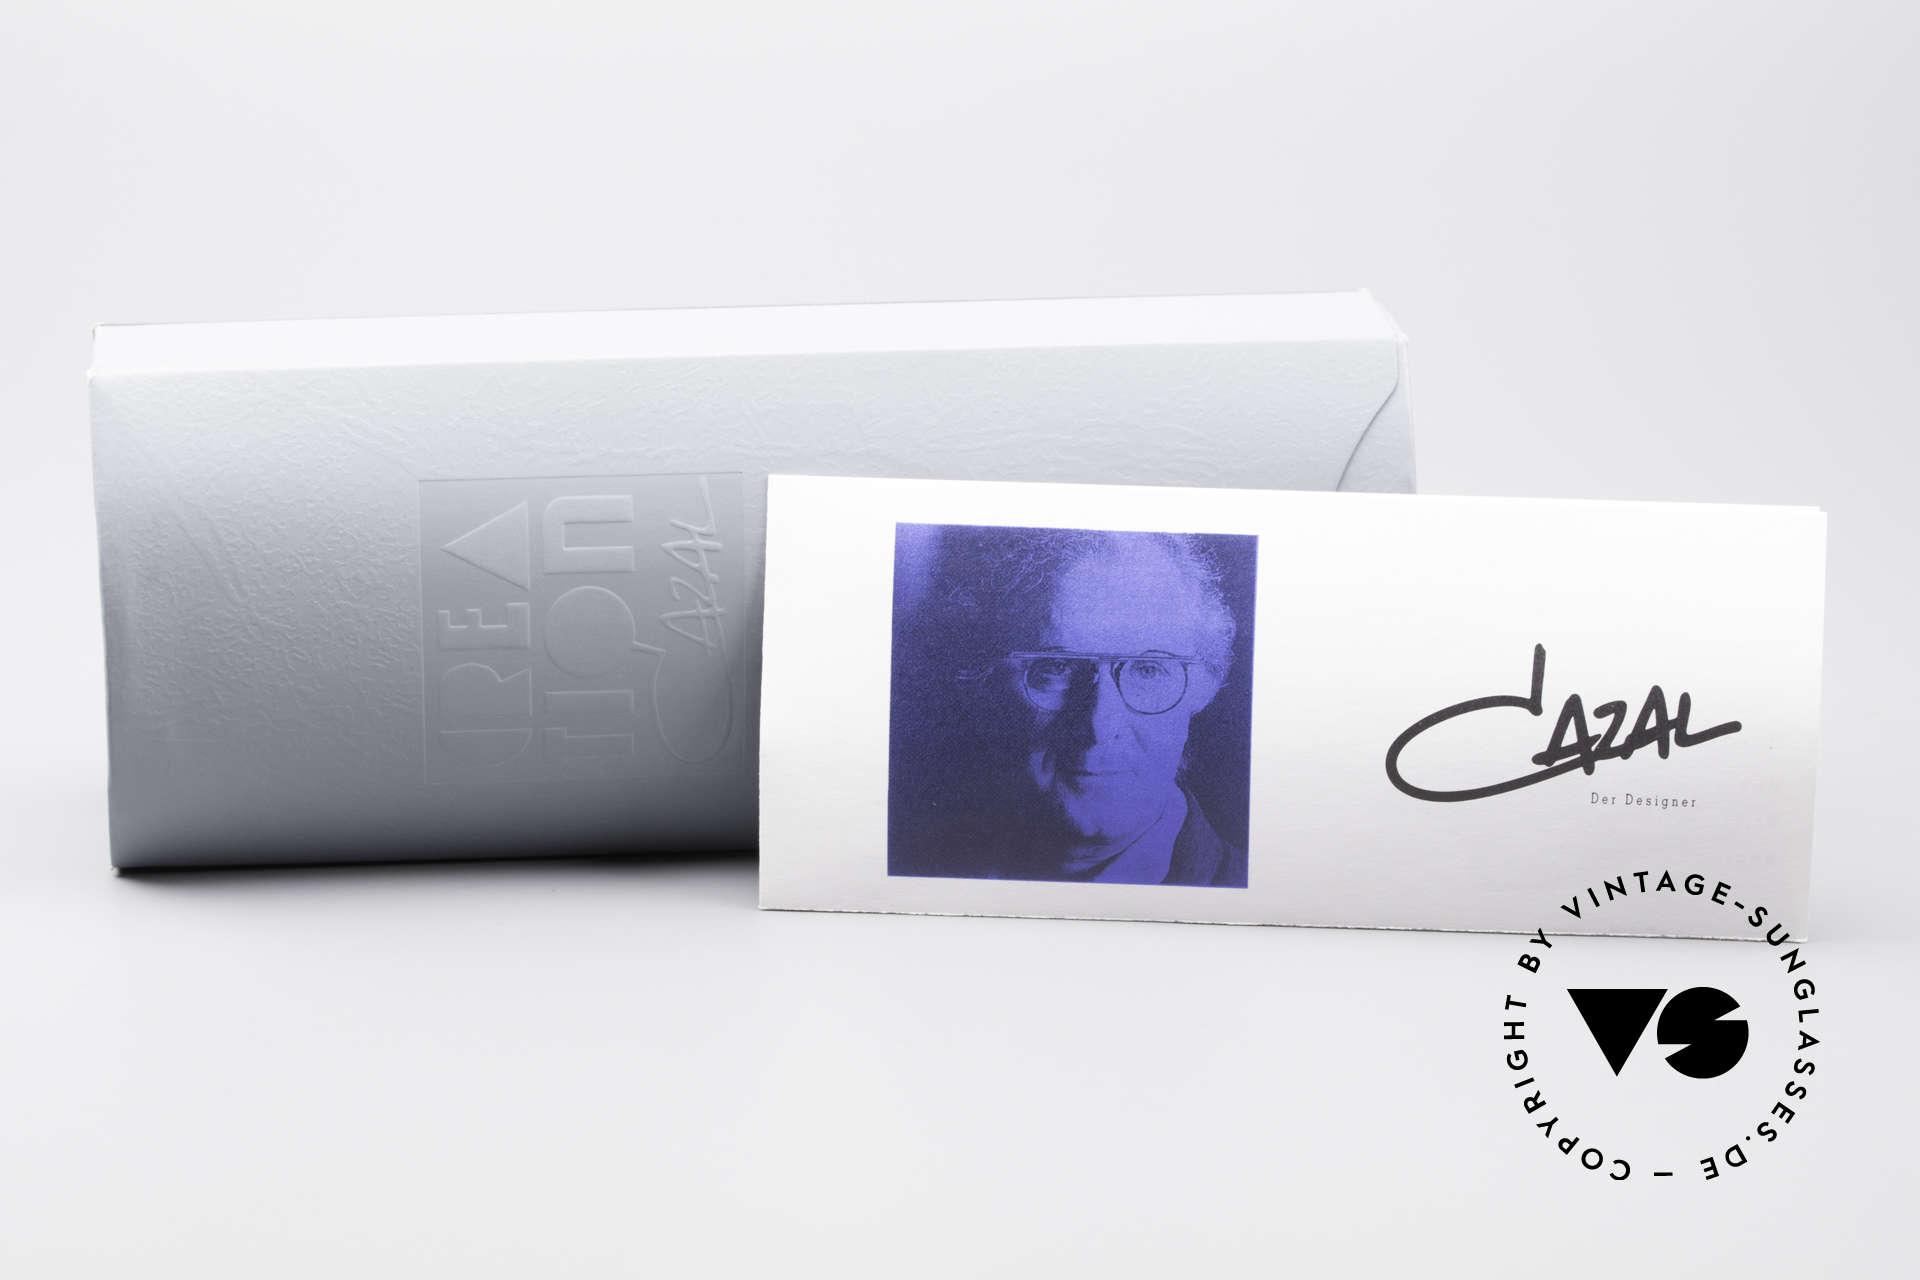 Cazal 958 90's CAzal Celebrity Sunglasses, Size: medium, Made for Men and Women